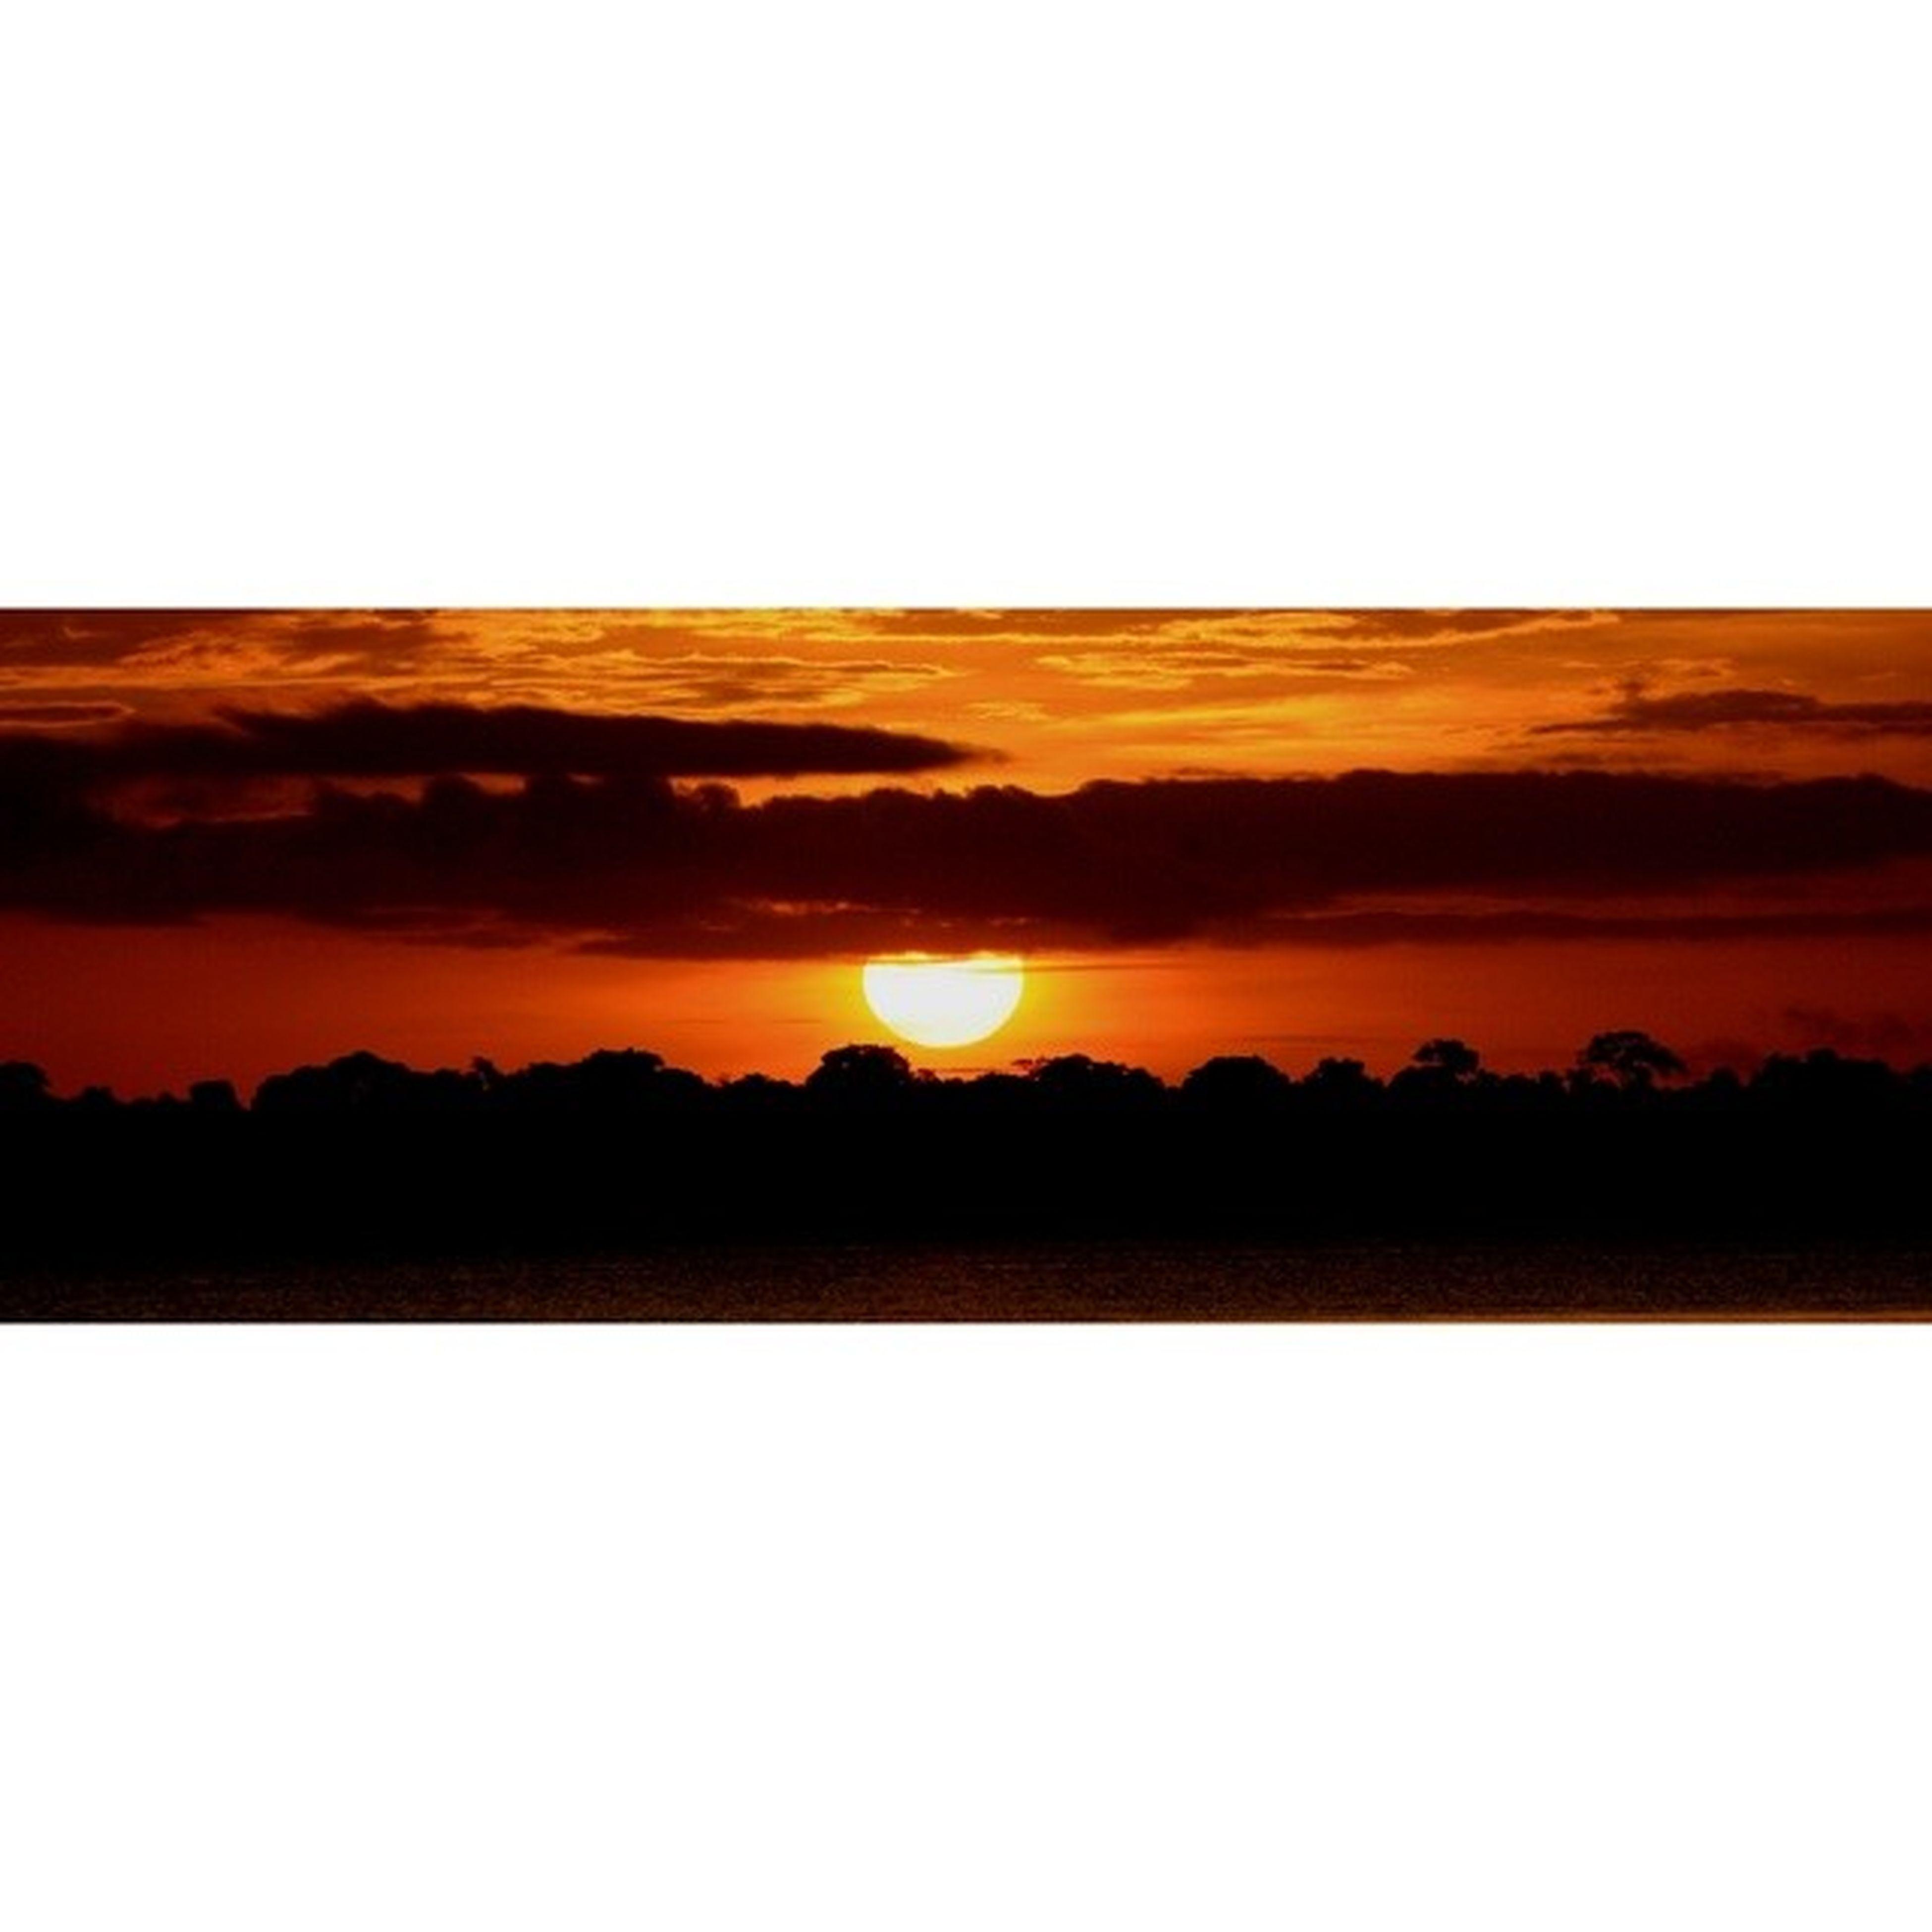 sunset, copy space, tranquil scene, scenics, tranquility, clear sky, beauty in nature, landscape, orange color, silhouette, nature, idyllic, mountain, sky, horizon over land, non-urban scene, sun, outdoors, remote, non urban scene